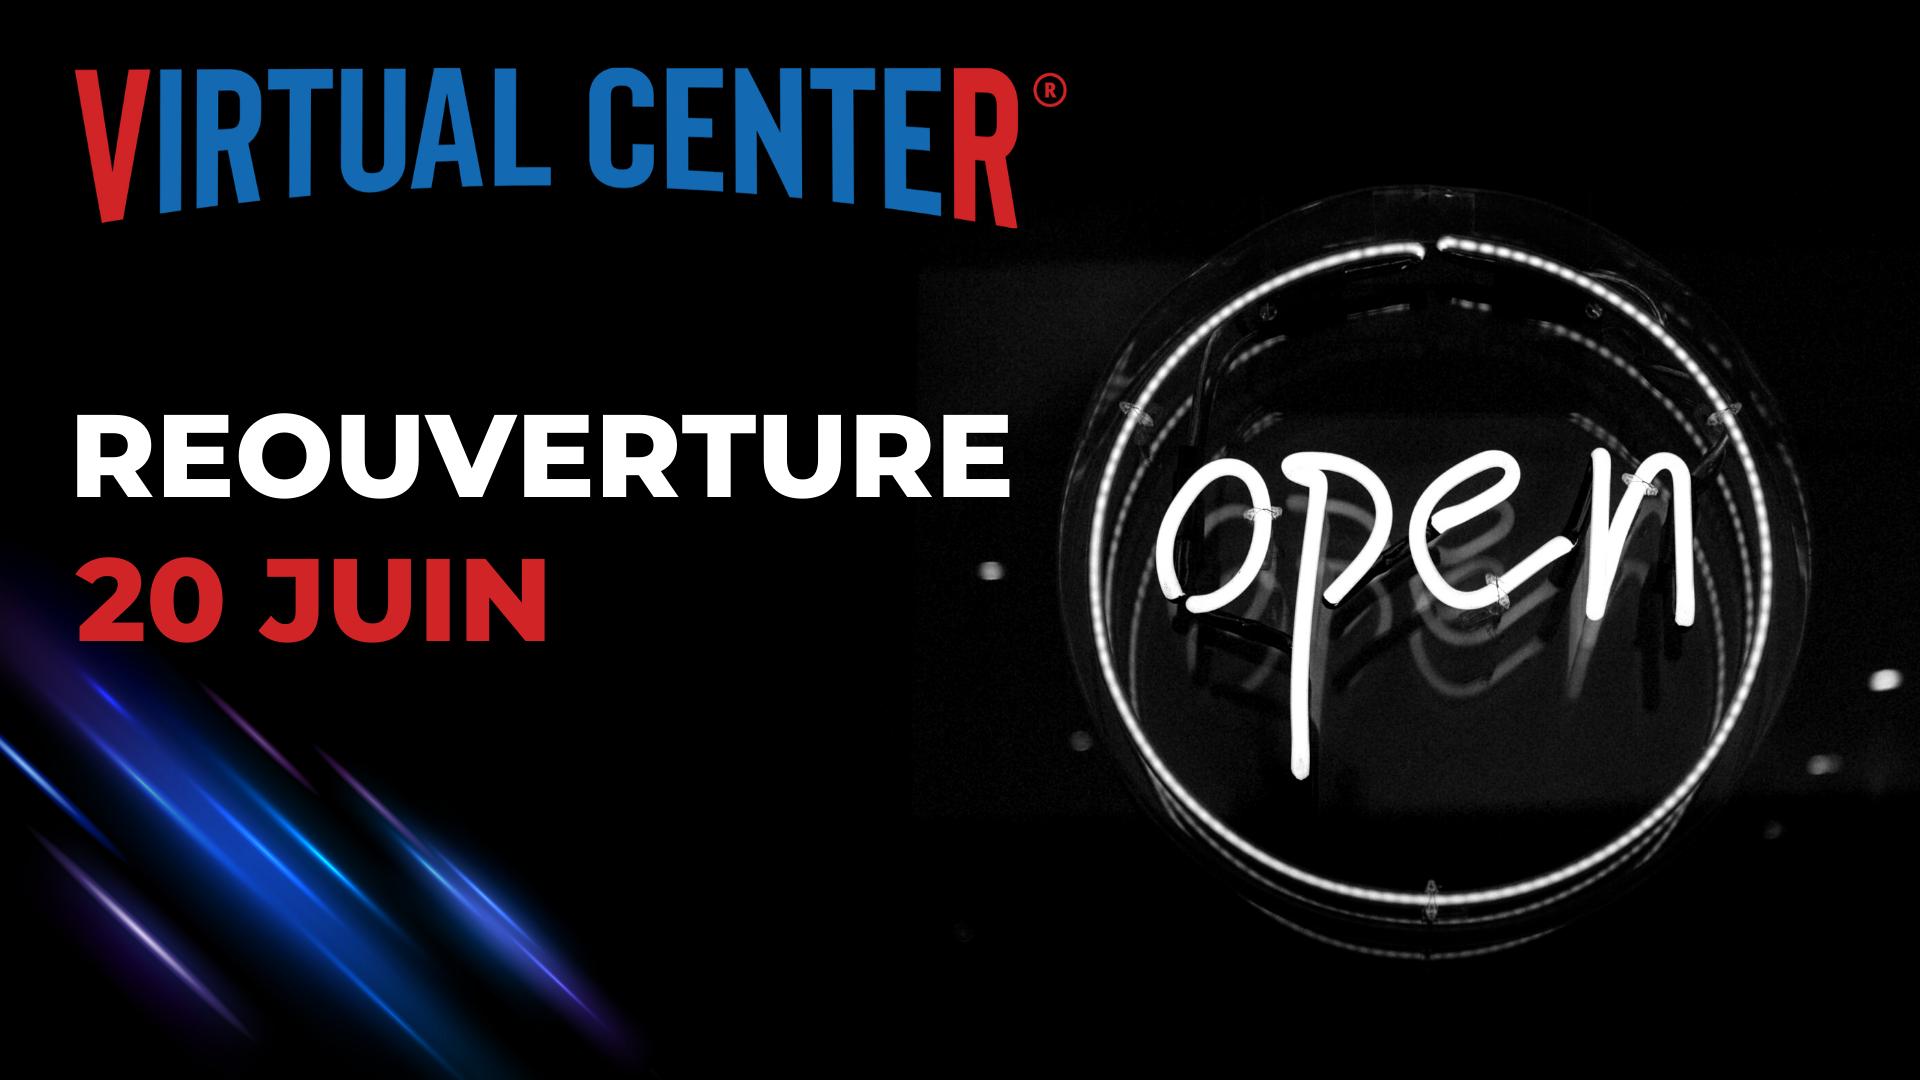 reouverture virtual center